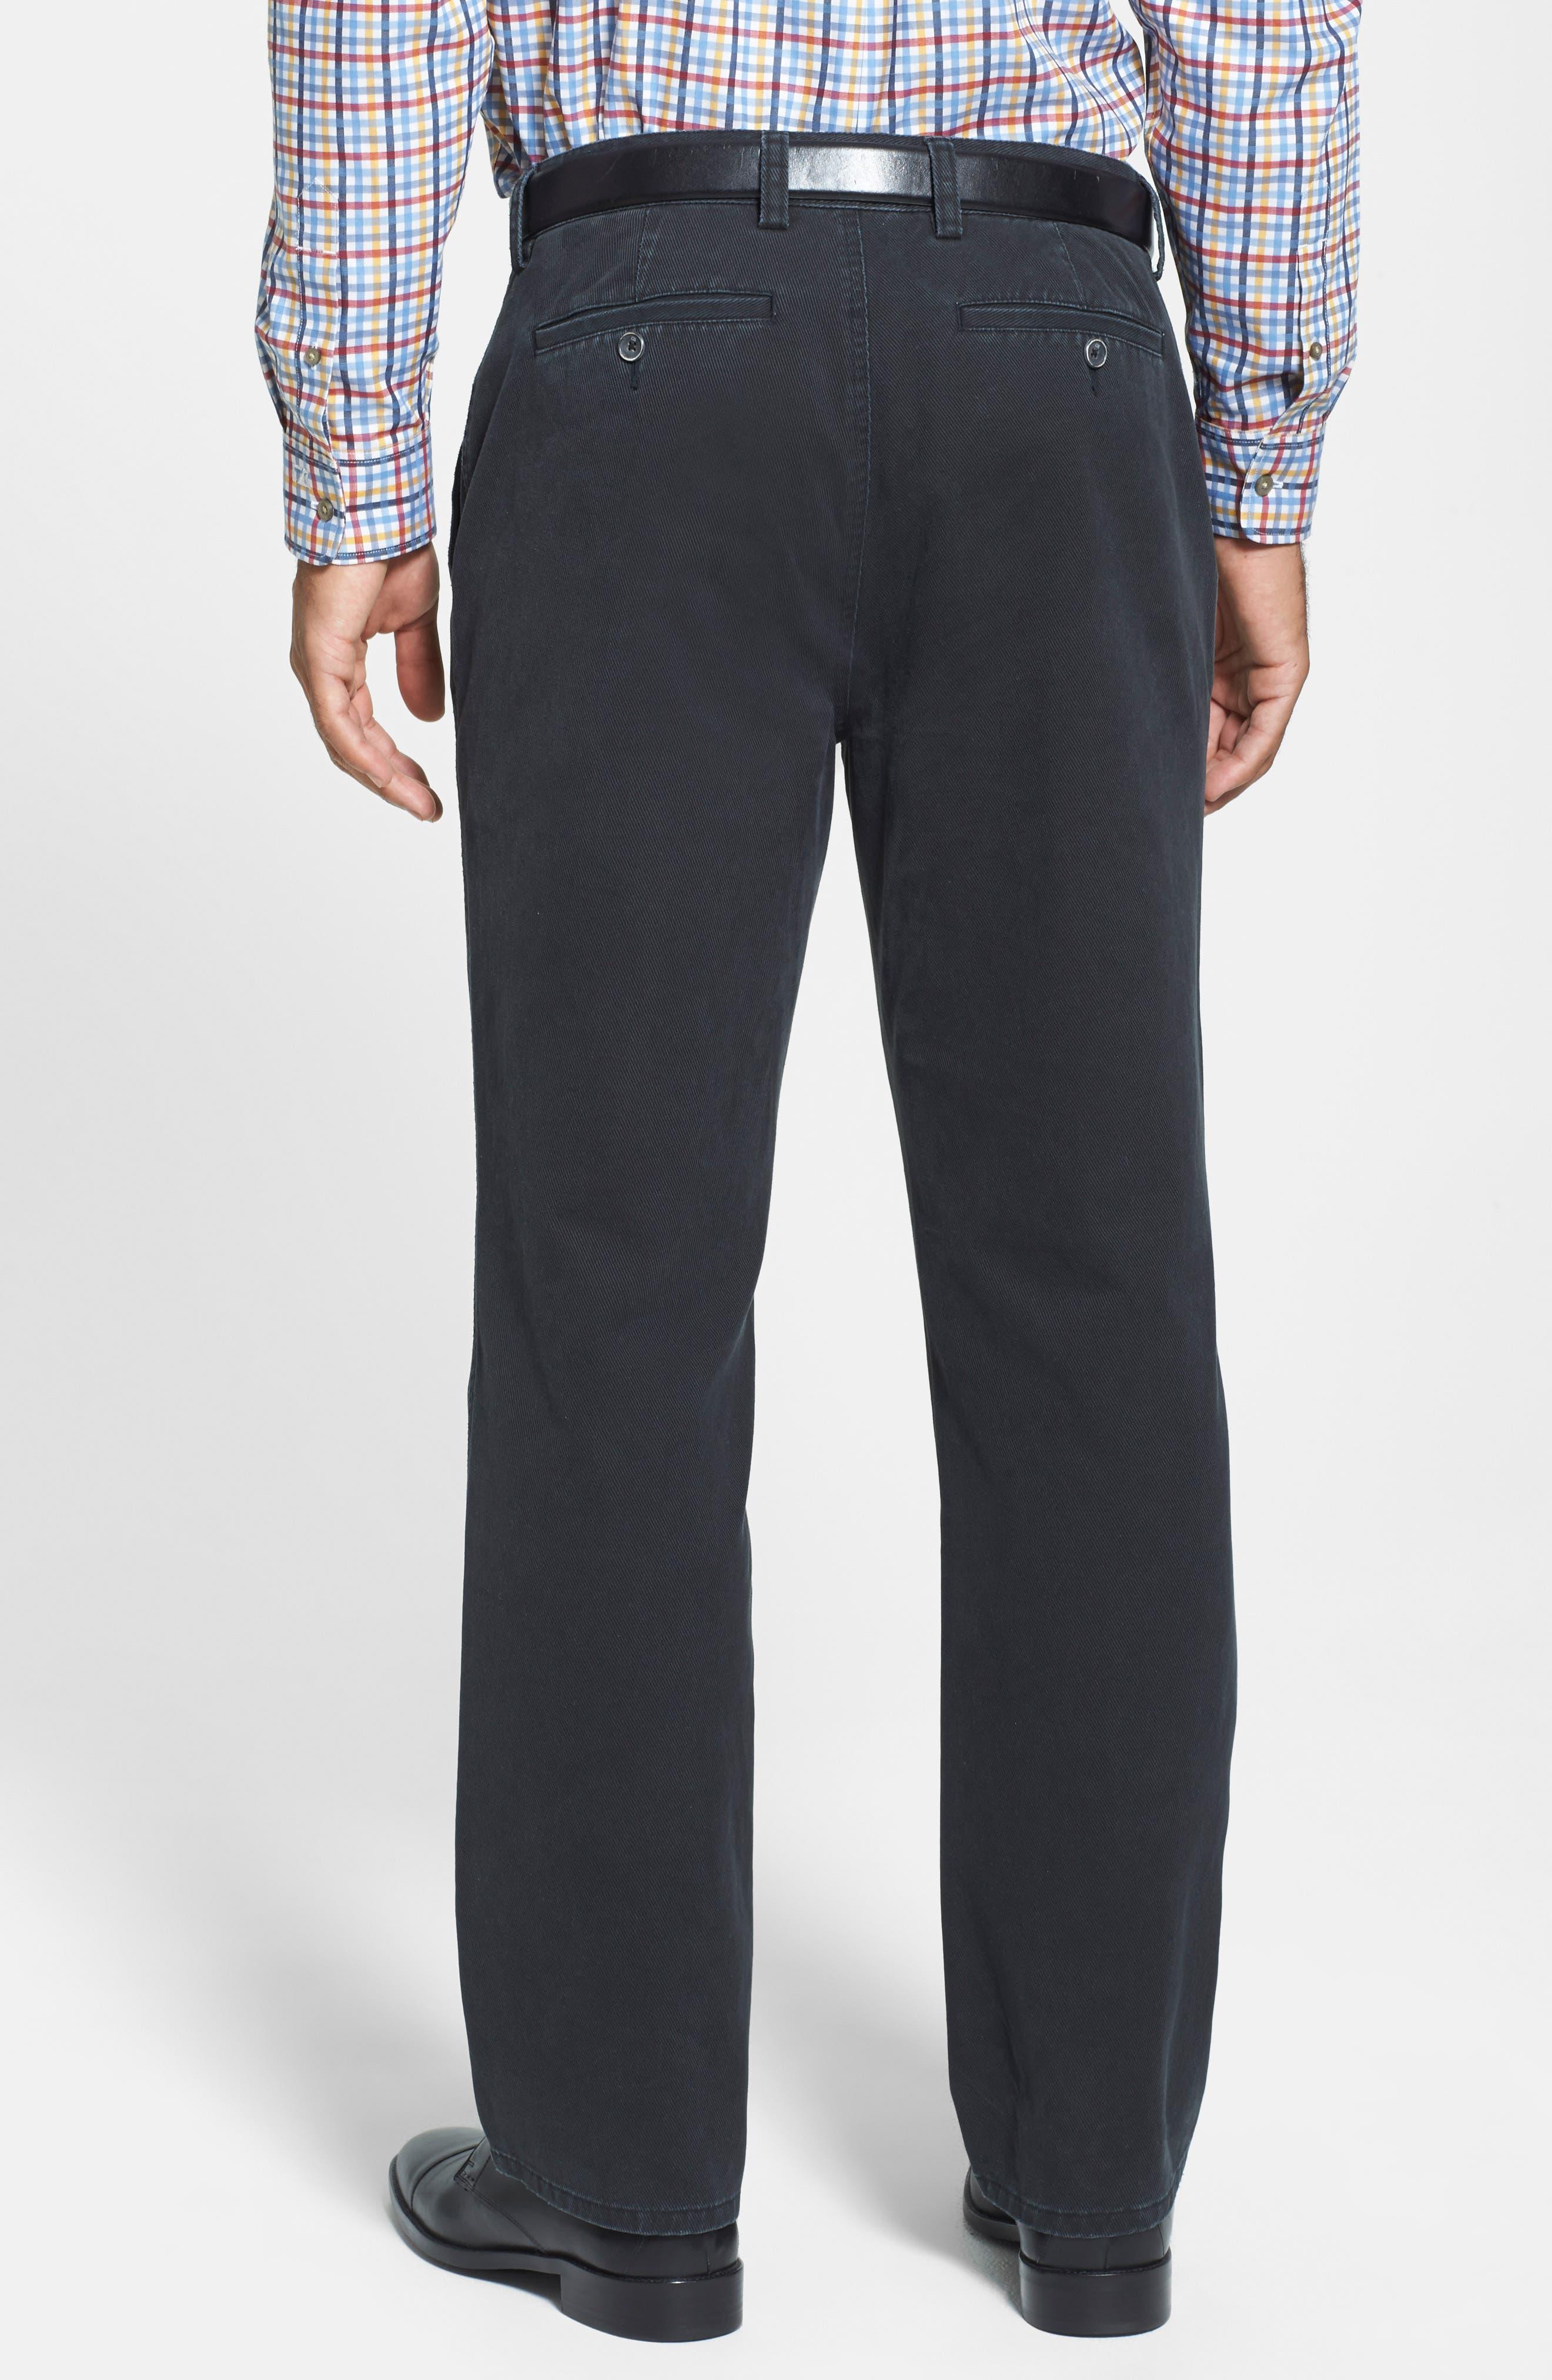 Curtis Flat Front Five-Pocket Cotton Twill Pants,                             Alternate thumbnail 3, color,                             BLACK